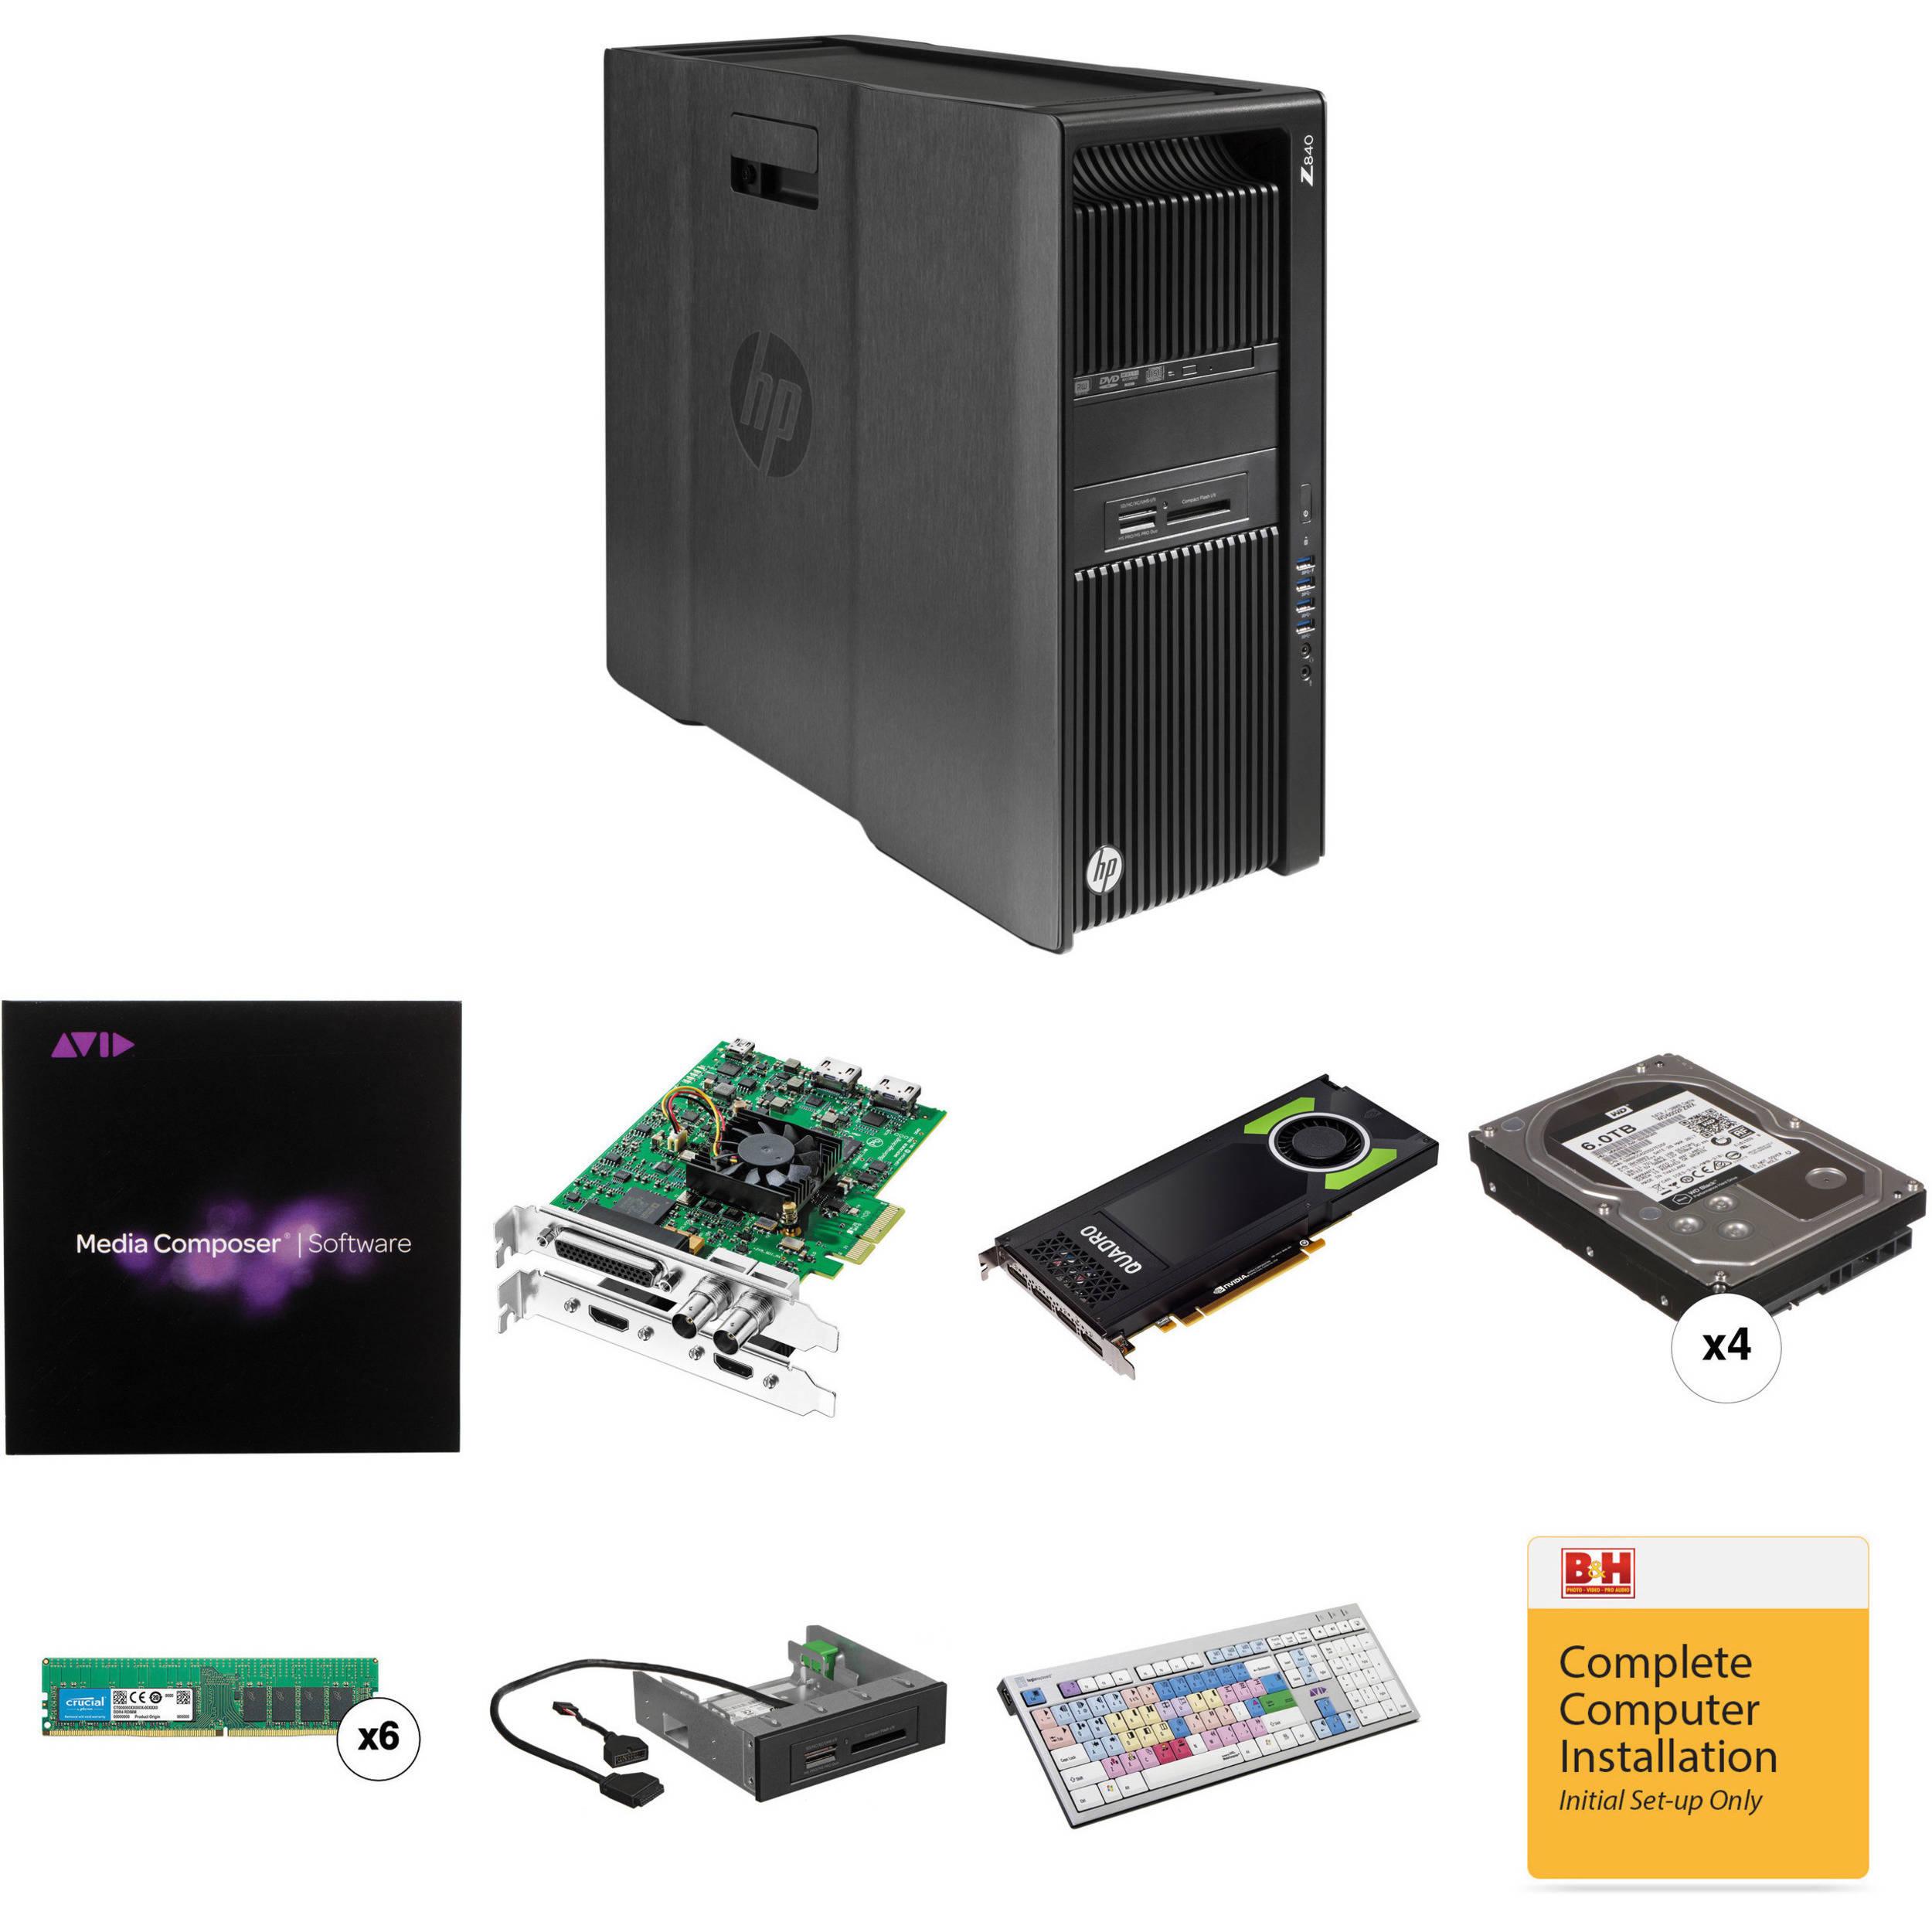 Pny technologies quadro sdi option ii output card table tablecloths